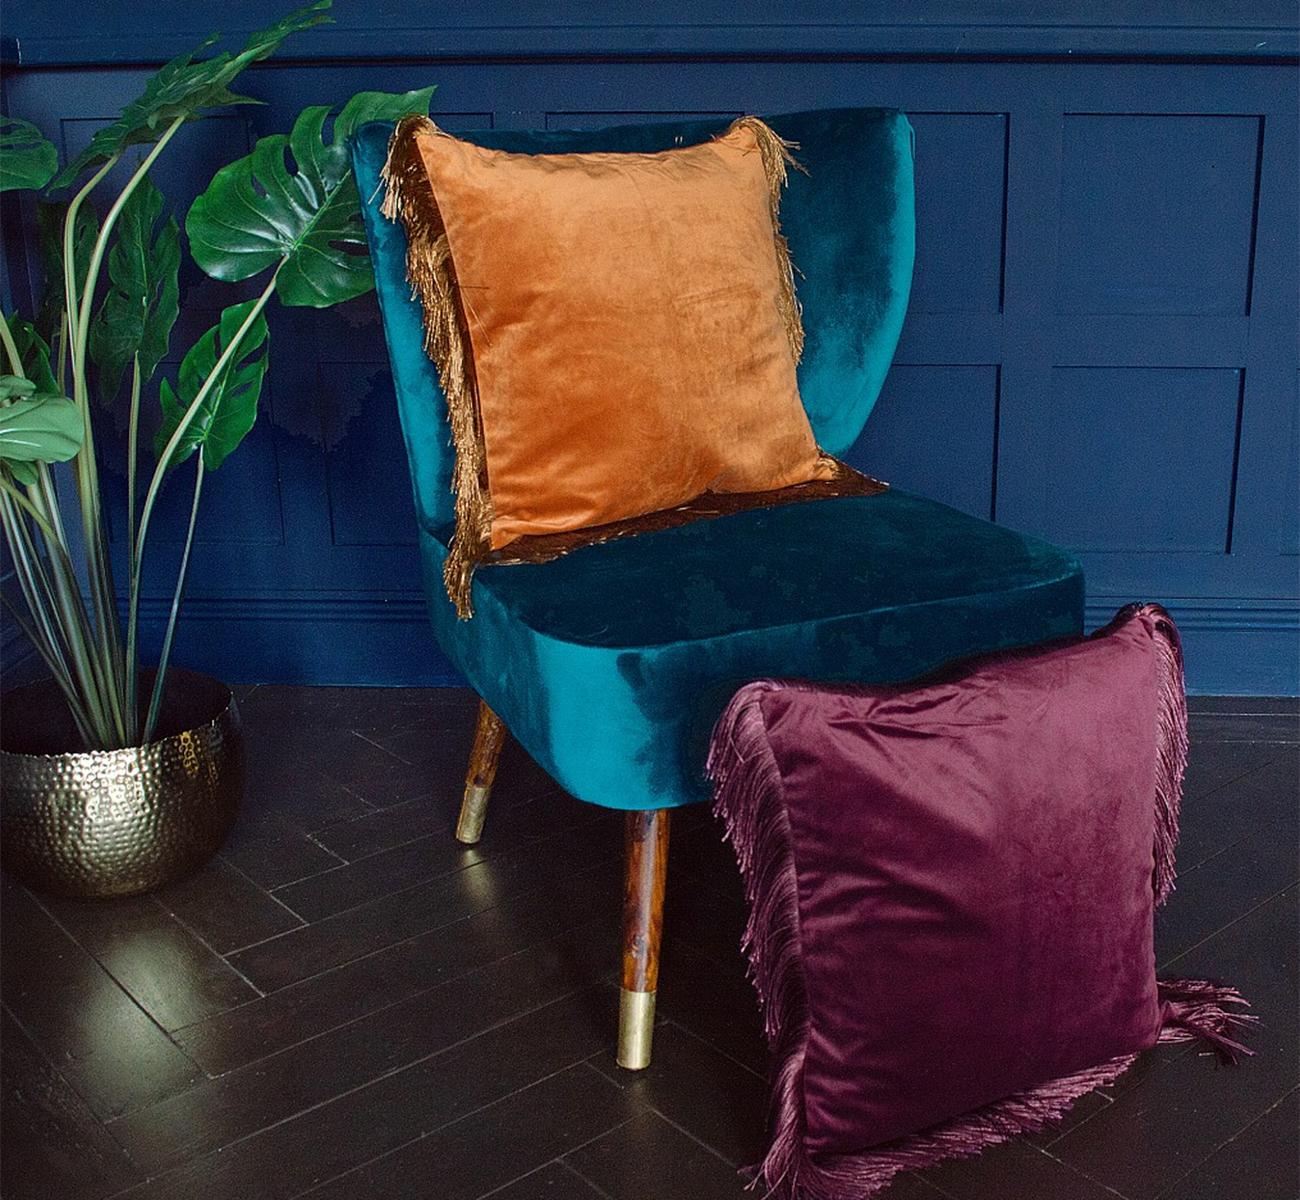 Freya Cushion Cover With Fringing, £24 ($30), Audenza, international delivery